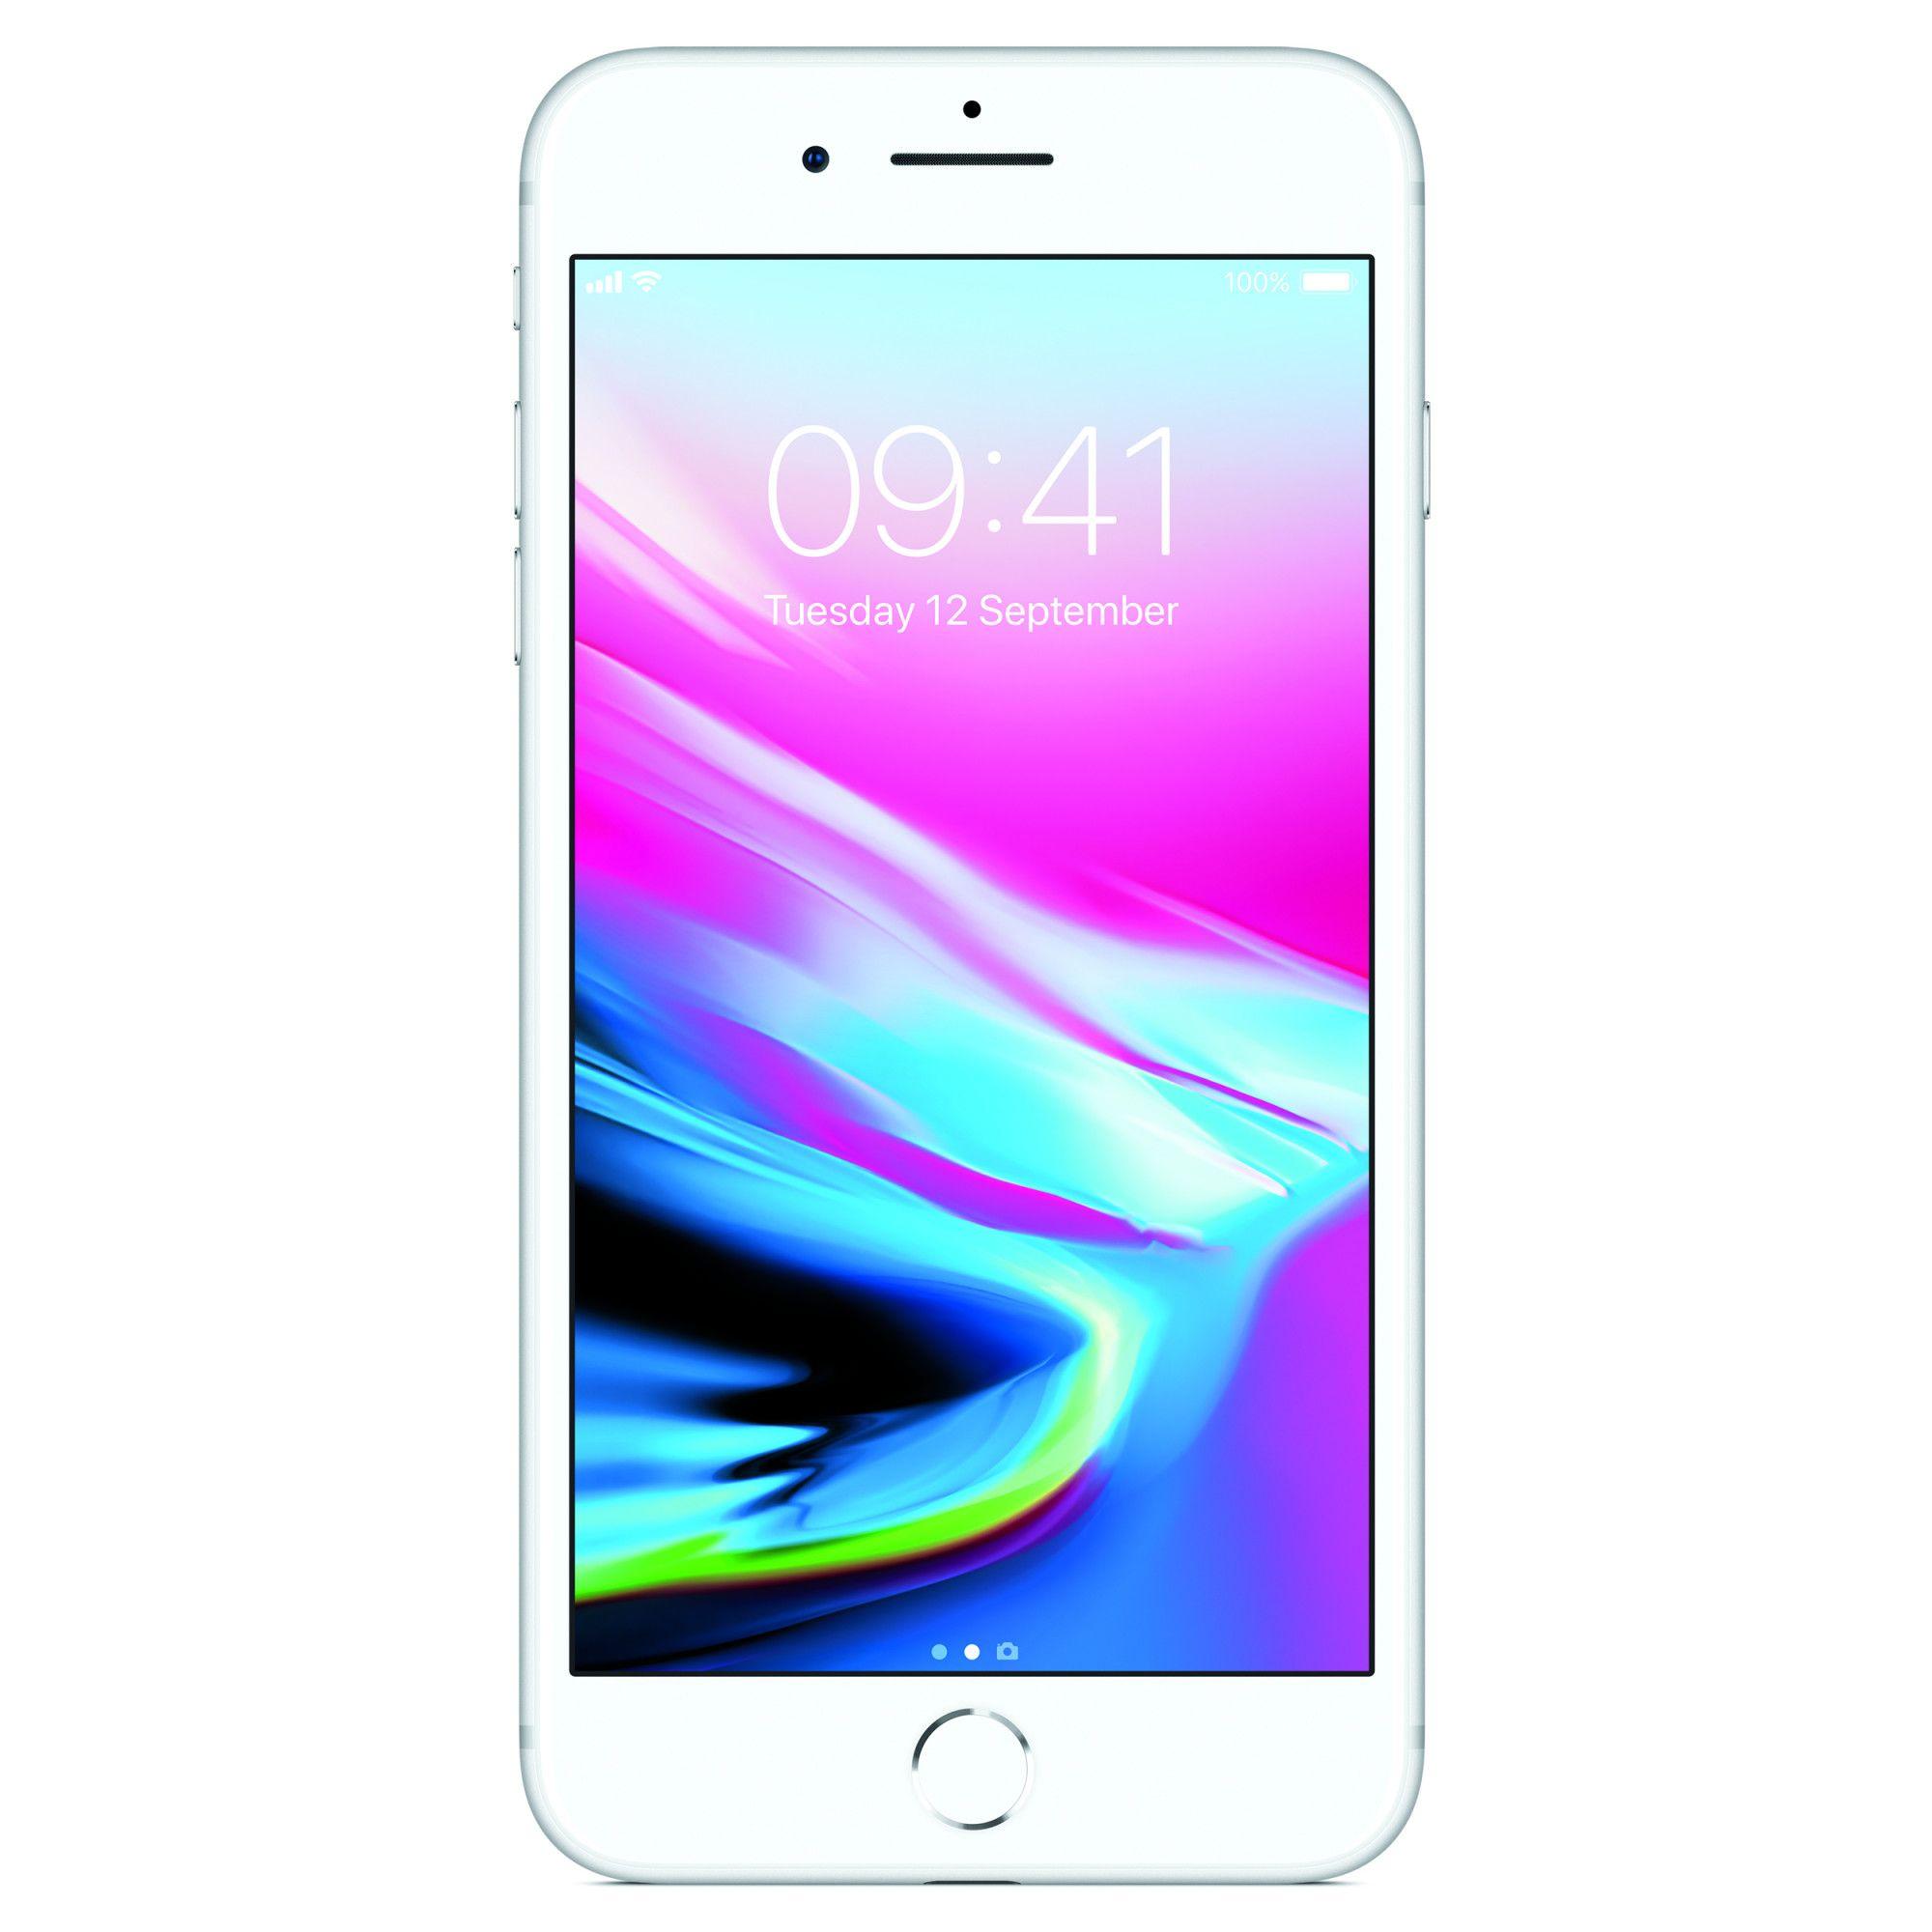 Telefon Mobil Apple iPhone 8 Plus 256GB Silver title=Telefon Mobil Apple iPhone 8 Plus 256GB Silver